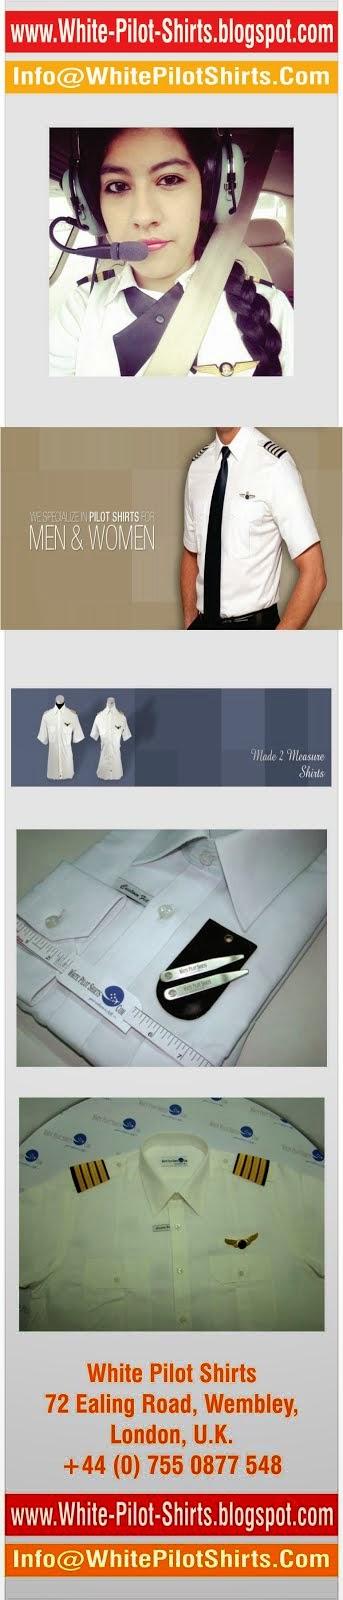 White-Pilot-Shirts